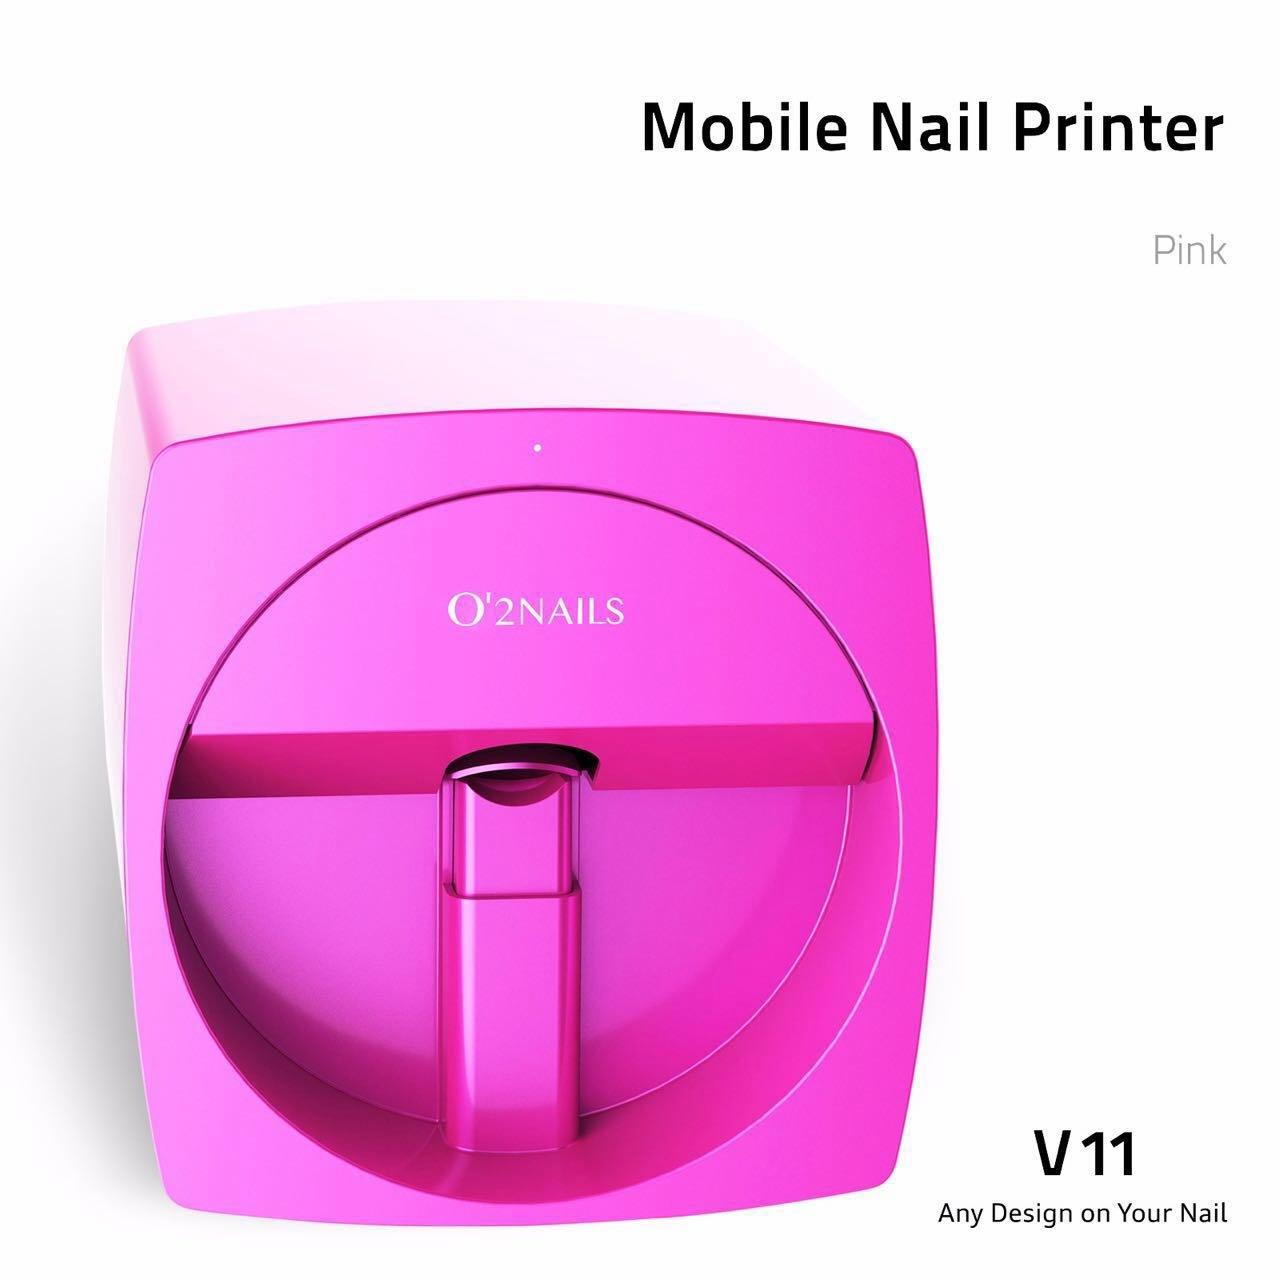 Amazon.com : Automatic Nail Painting Machine Multifunction Portable ...